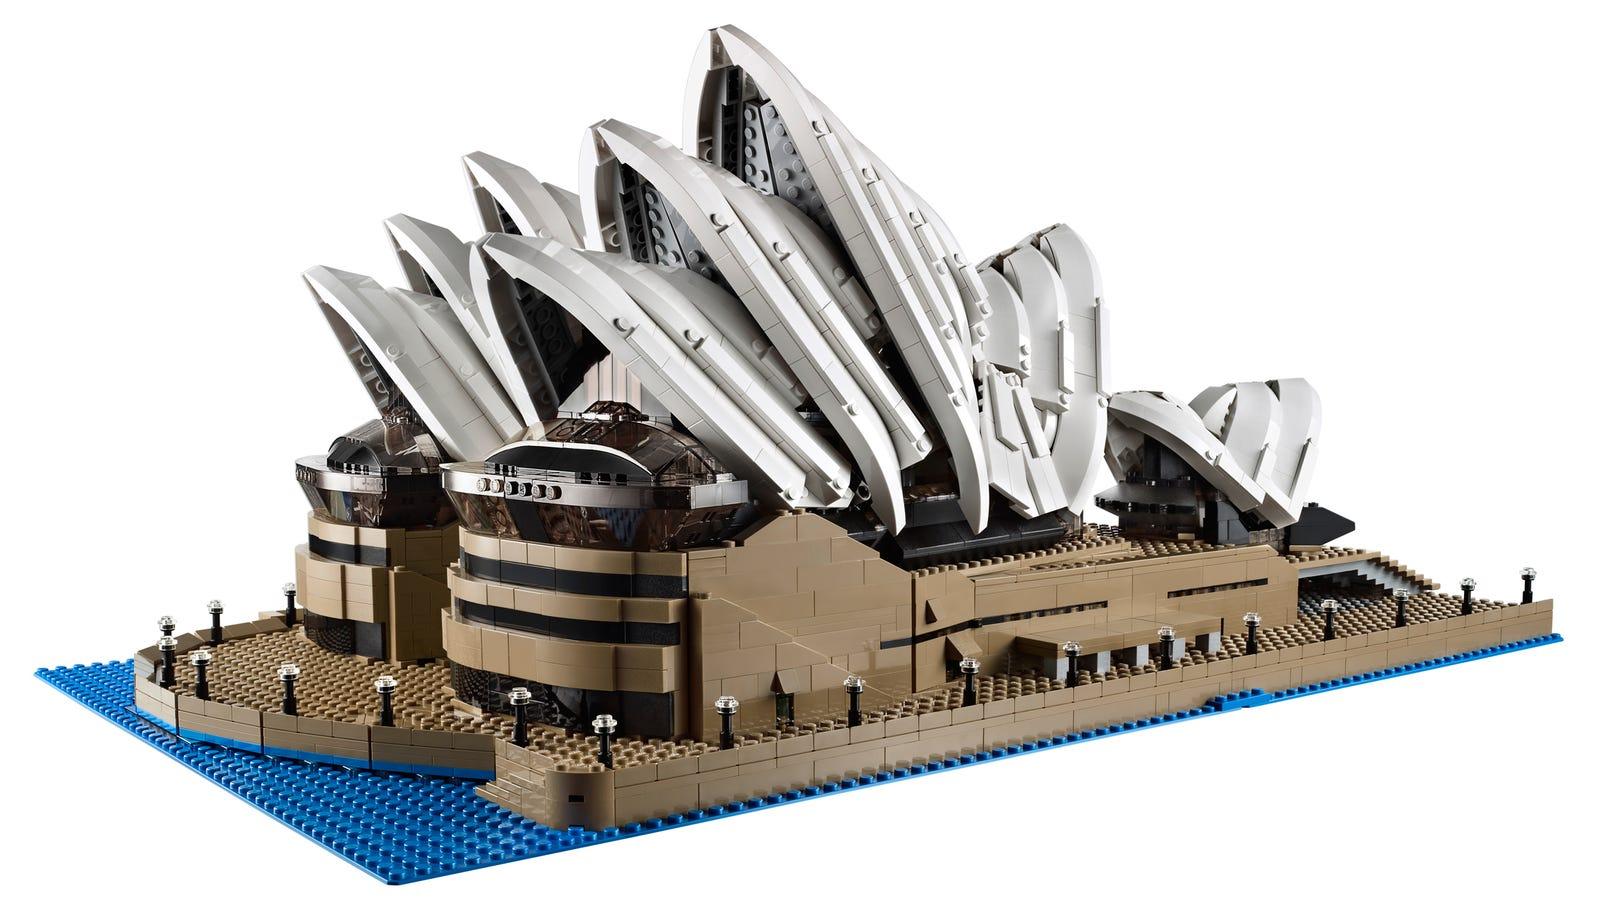 New Lego Sydney Opera House Is Huge—Almost 3,000 Bricks